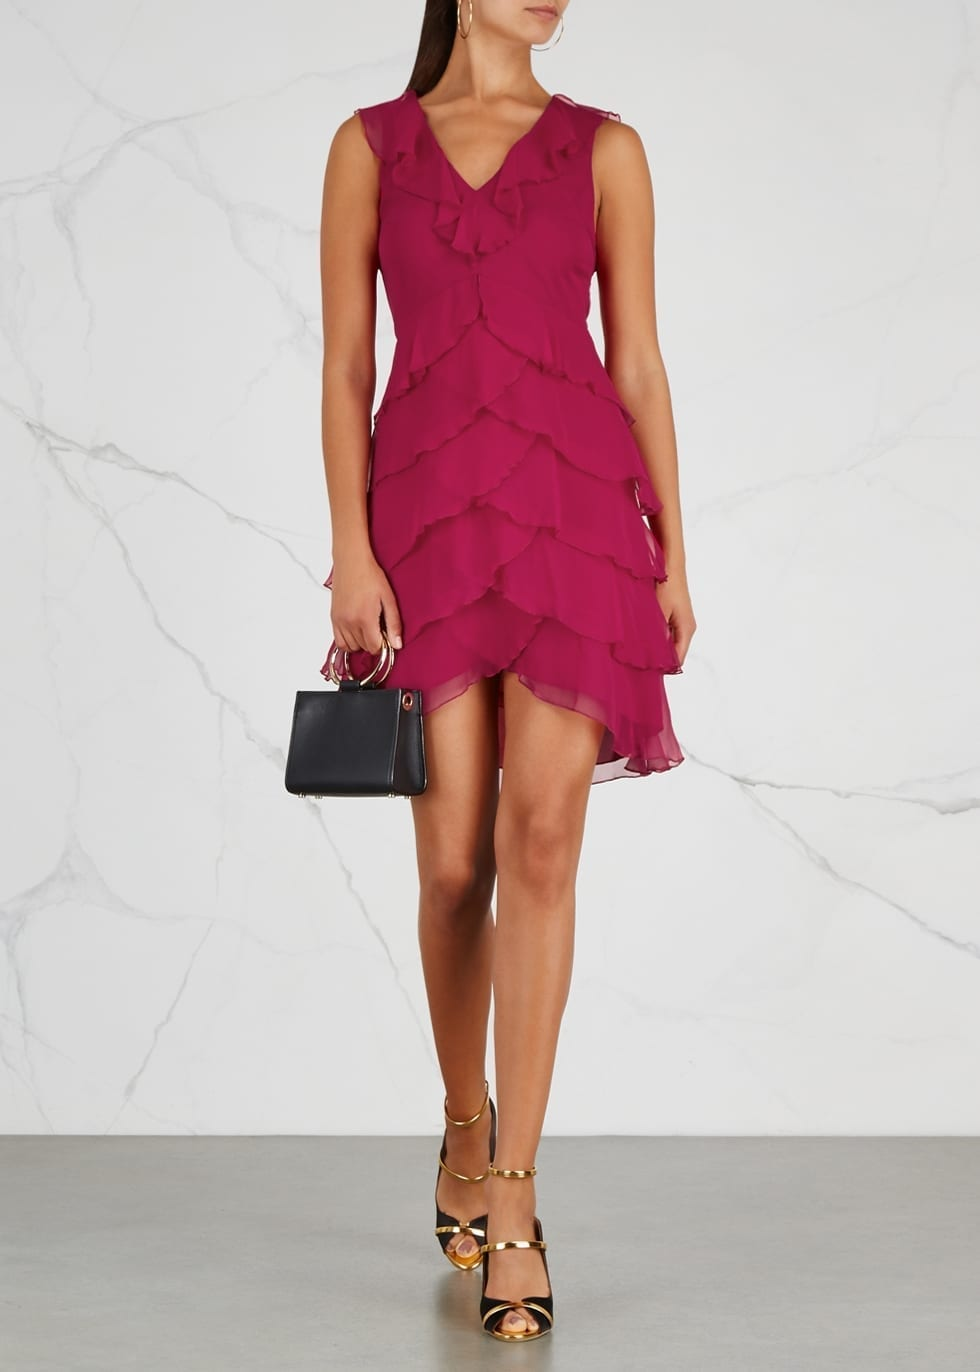 ALICE + OLIVIA Felicita Ruffled Silk Chiffon Midi Fuchsia Dress